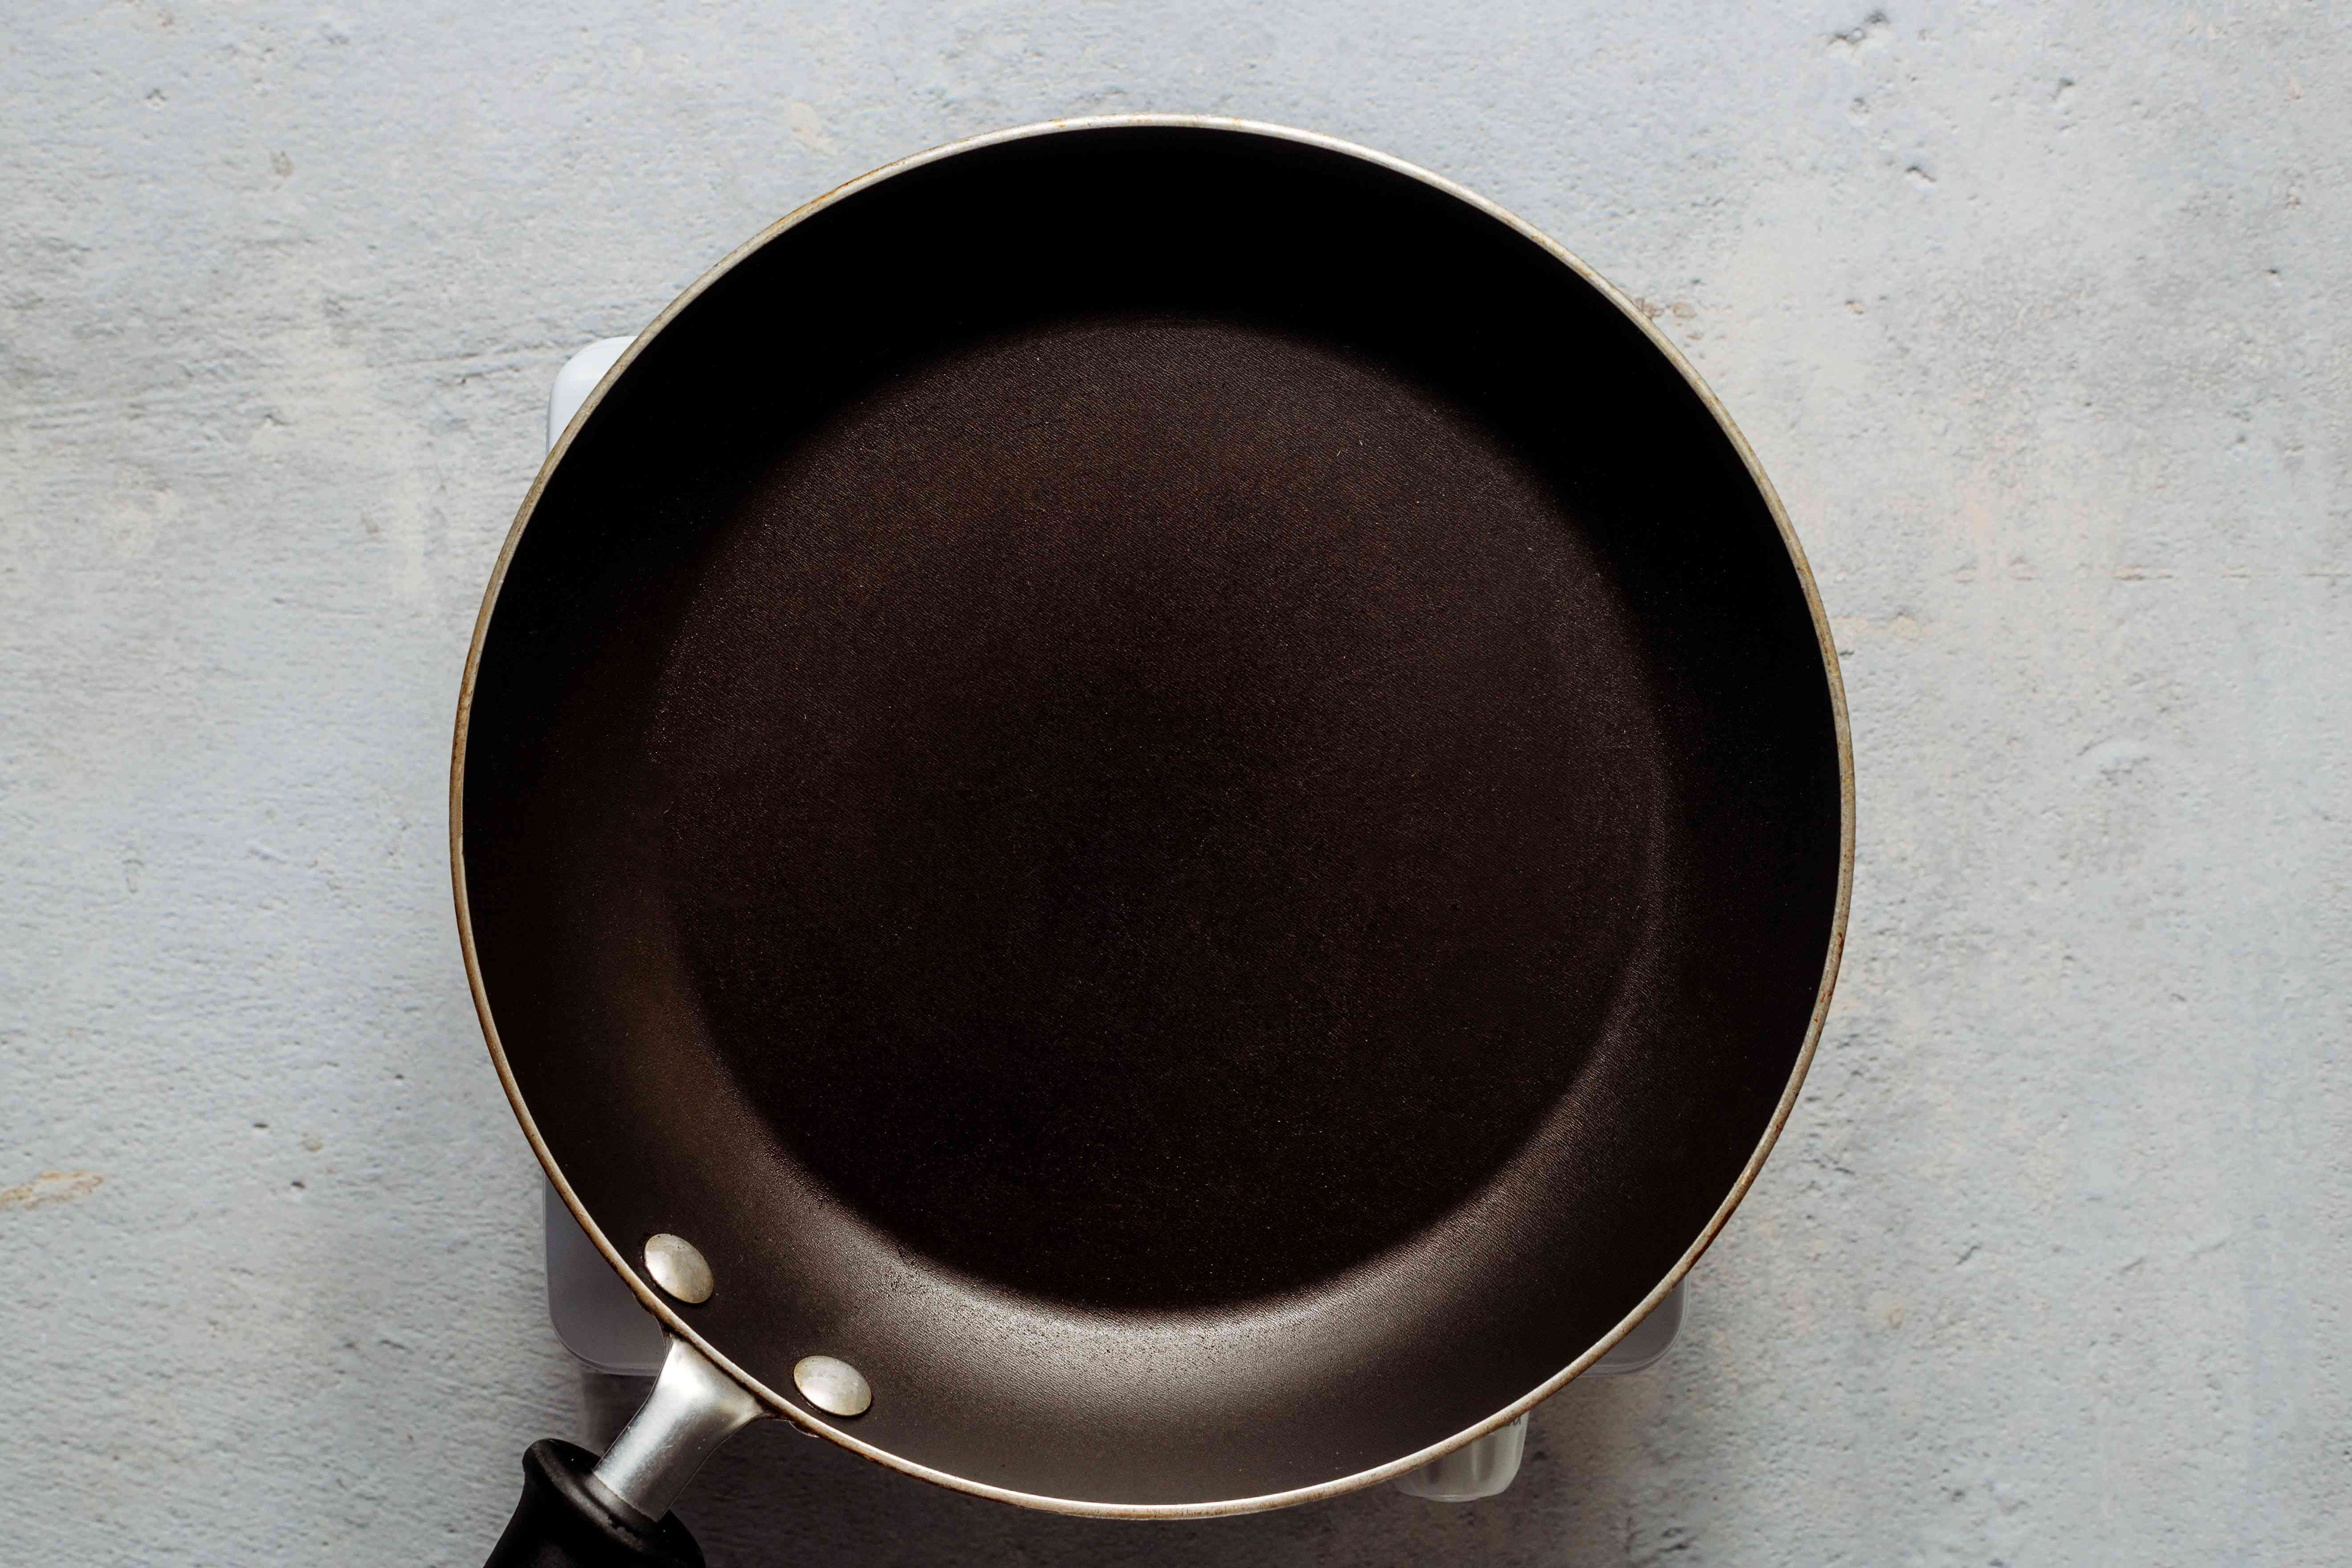 heated pan